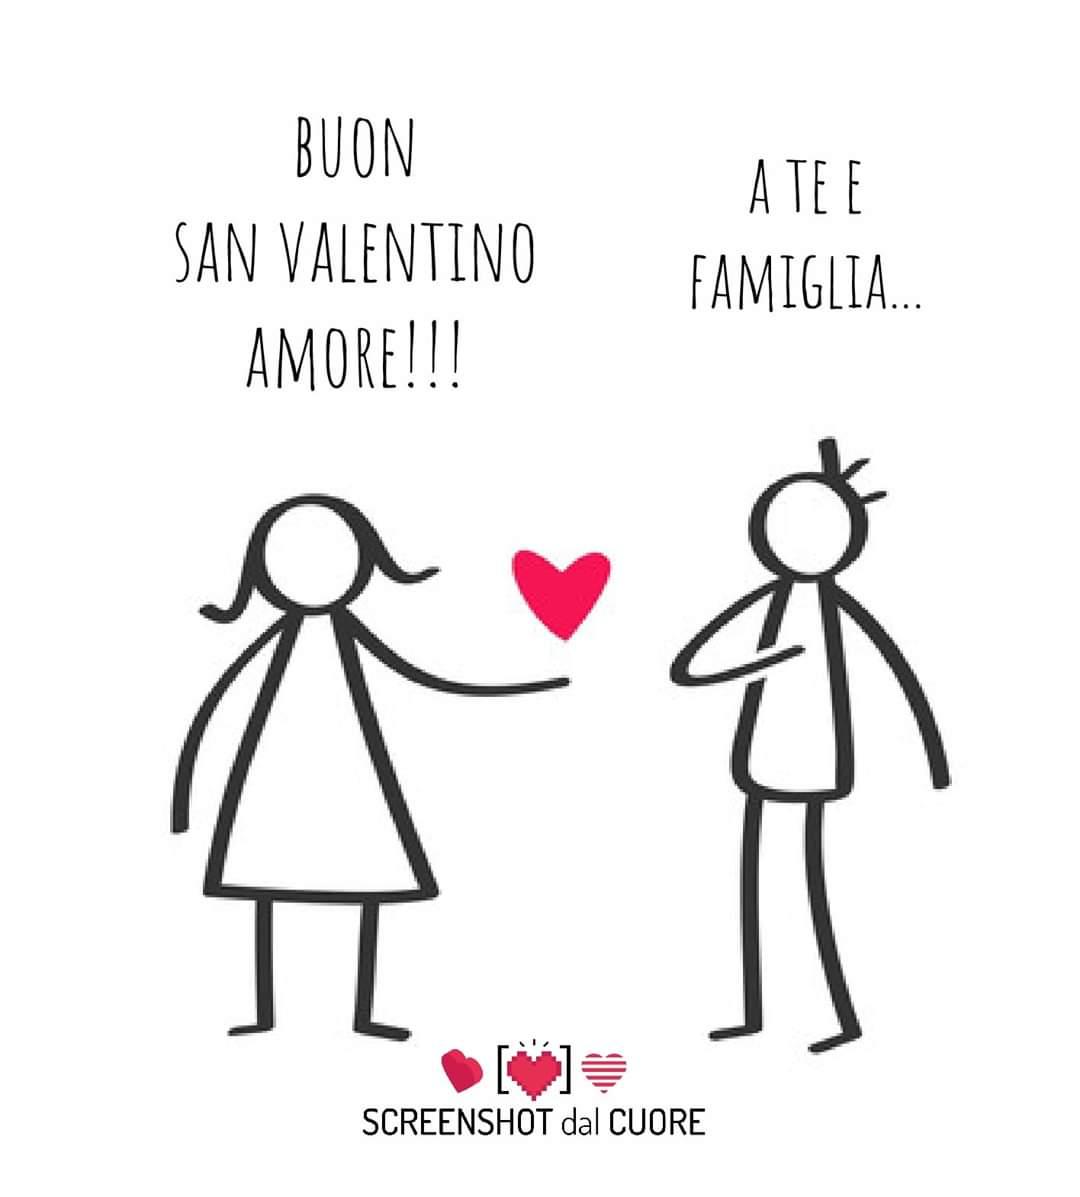 San Valentino 2020  #trumblr #frasitrumblr #scrittore #frasi #ultimiribelli #writer #trumblrpost #leggere #love #citazioni #aforismi #frasitop #frasibelle #frasivere #parole #poesia #versi #citazioni #6sense #pensieri #frasiitaliane #scrivere #amore #emozioni #SanValentín2020pic.twitter.com/YT5eUDtBwC